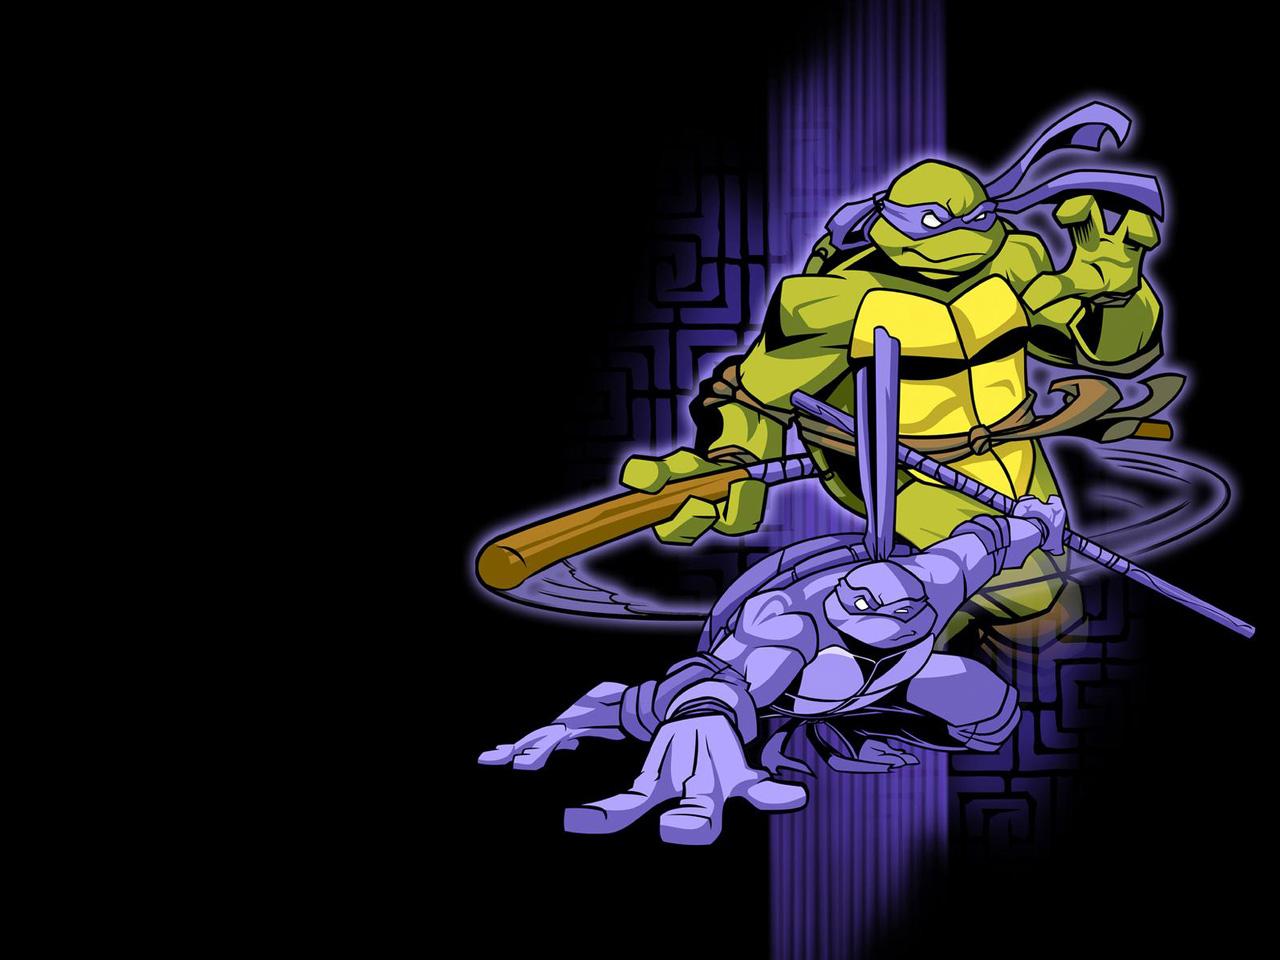 TMNT wallpaper 2003-2009 series (27)